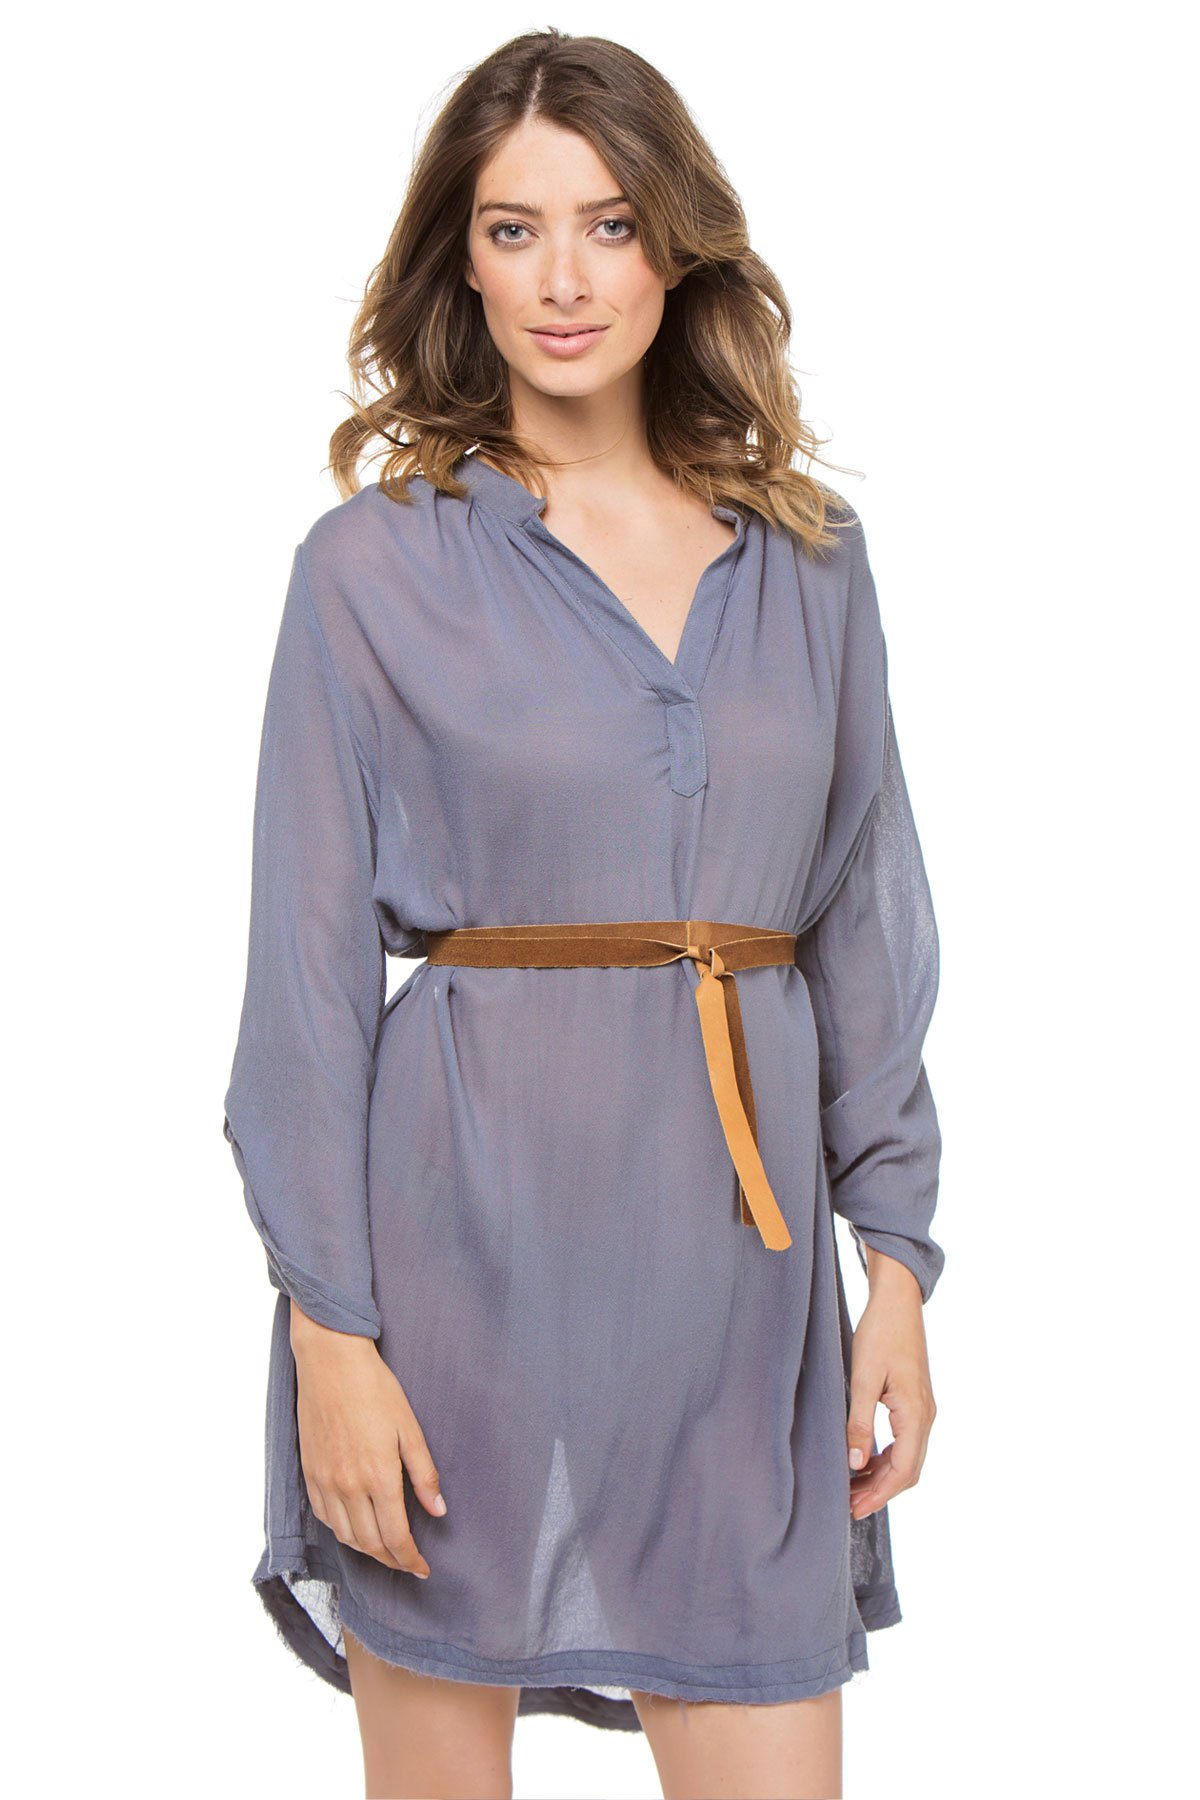 Eberjey Women's Summer Of Love Long Sleeve Dress Swim Cover Up Flint Stone S/M